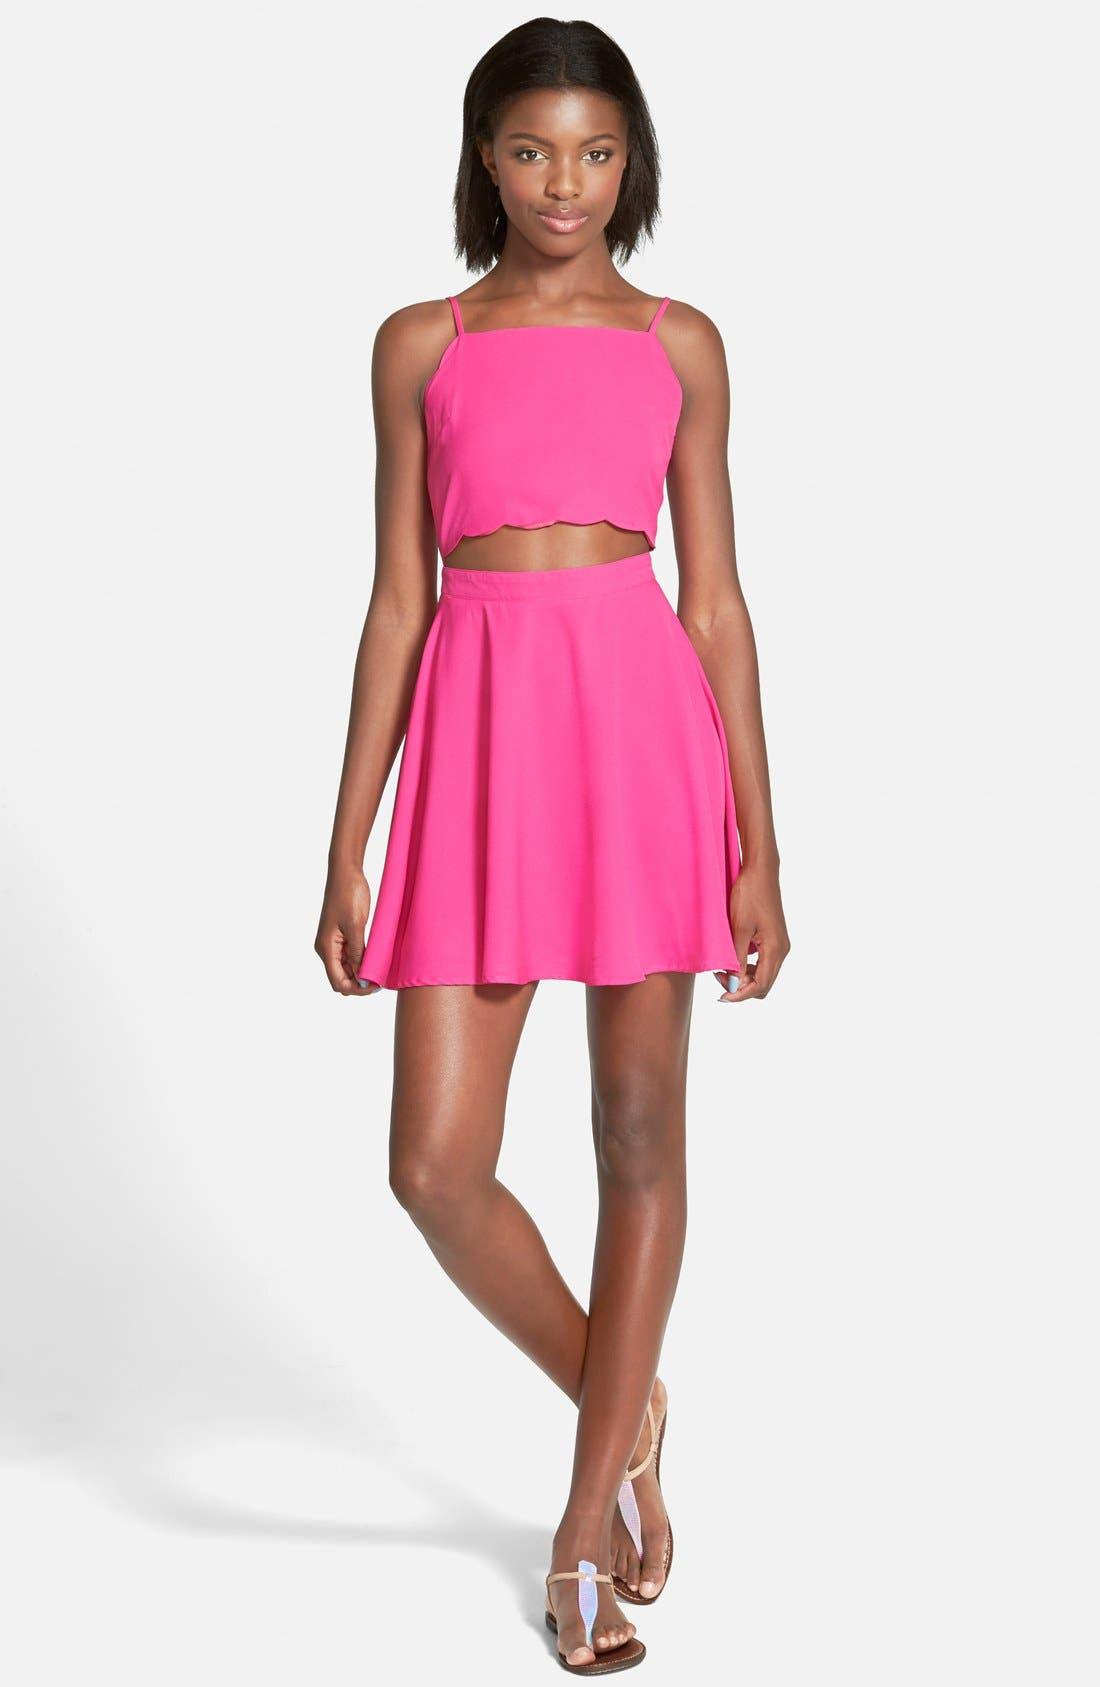 Alternate Image 1 Selected - Cream and Sugar Cutout Skater Dress